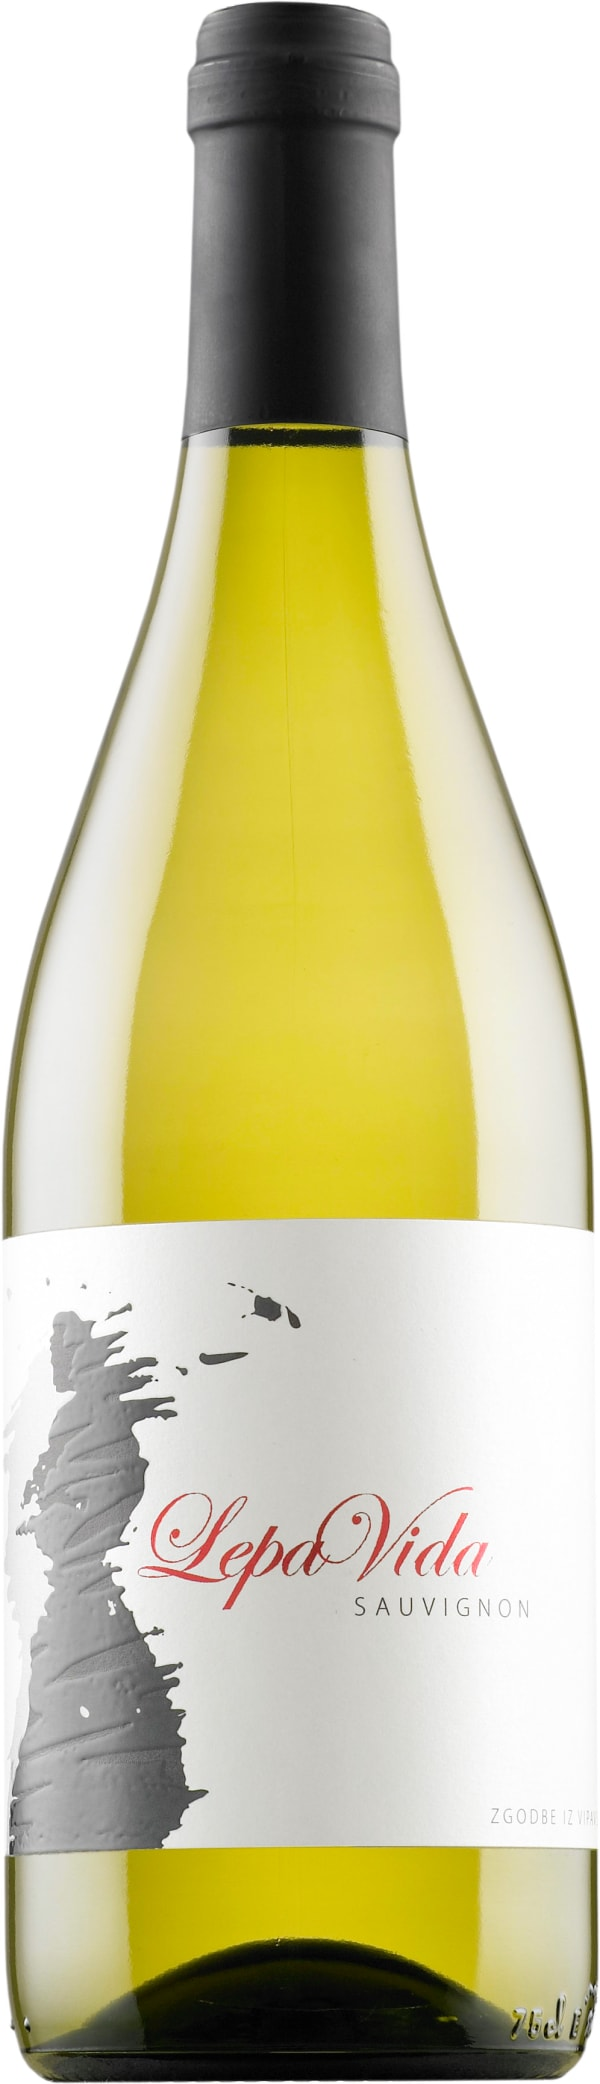 Lepa Vida Sauvignon Blanc 2015